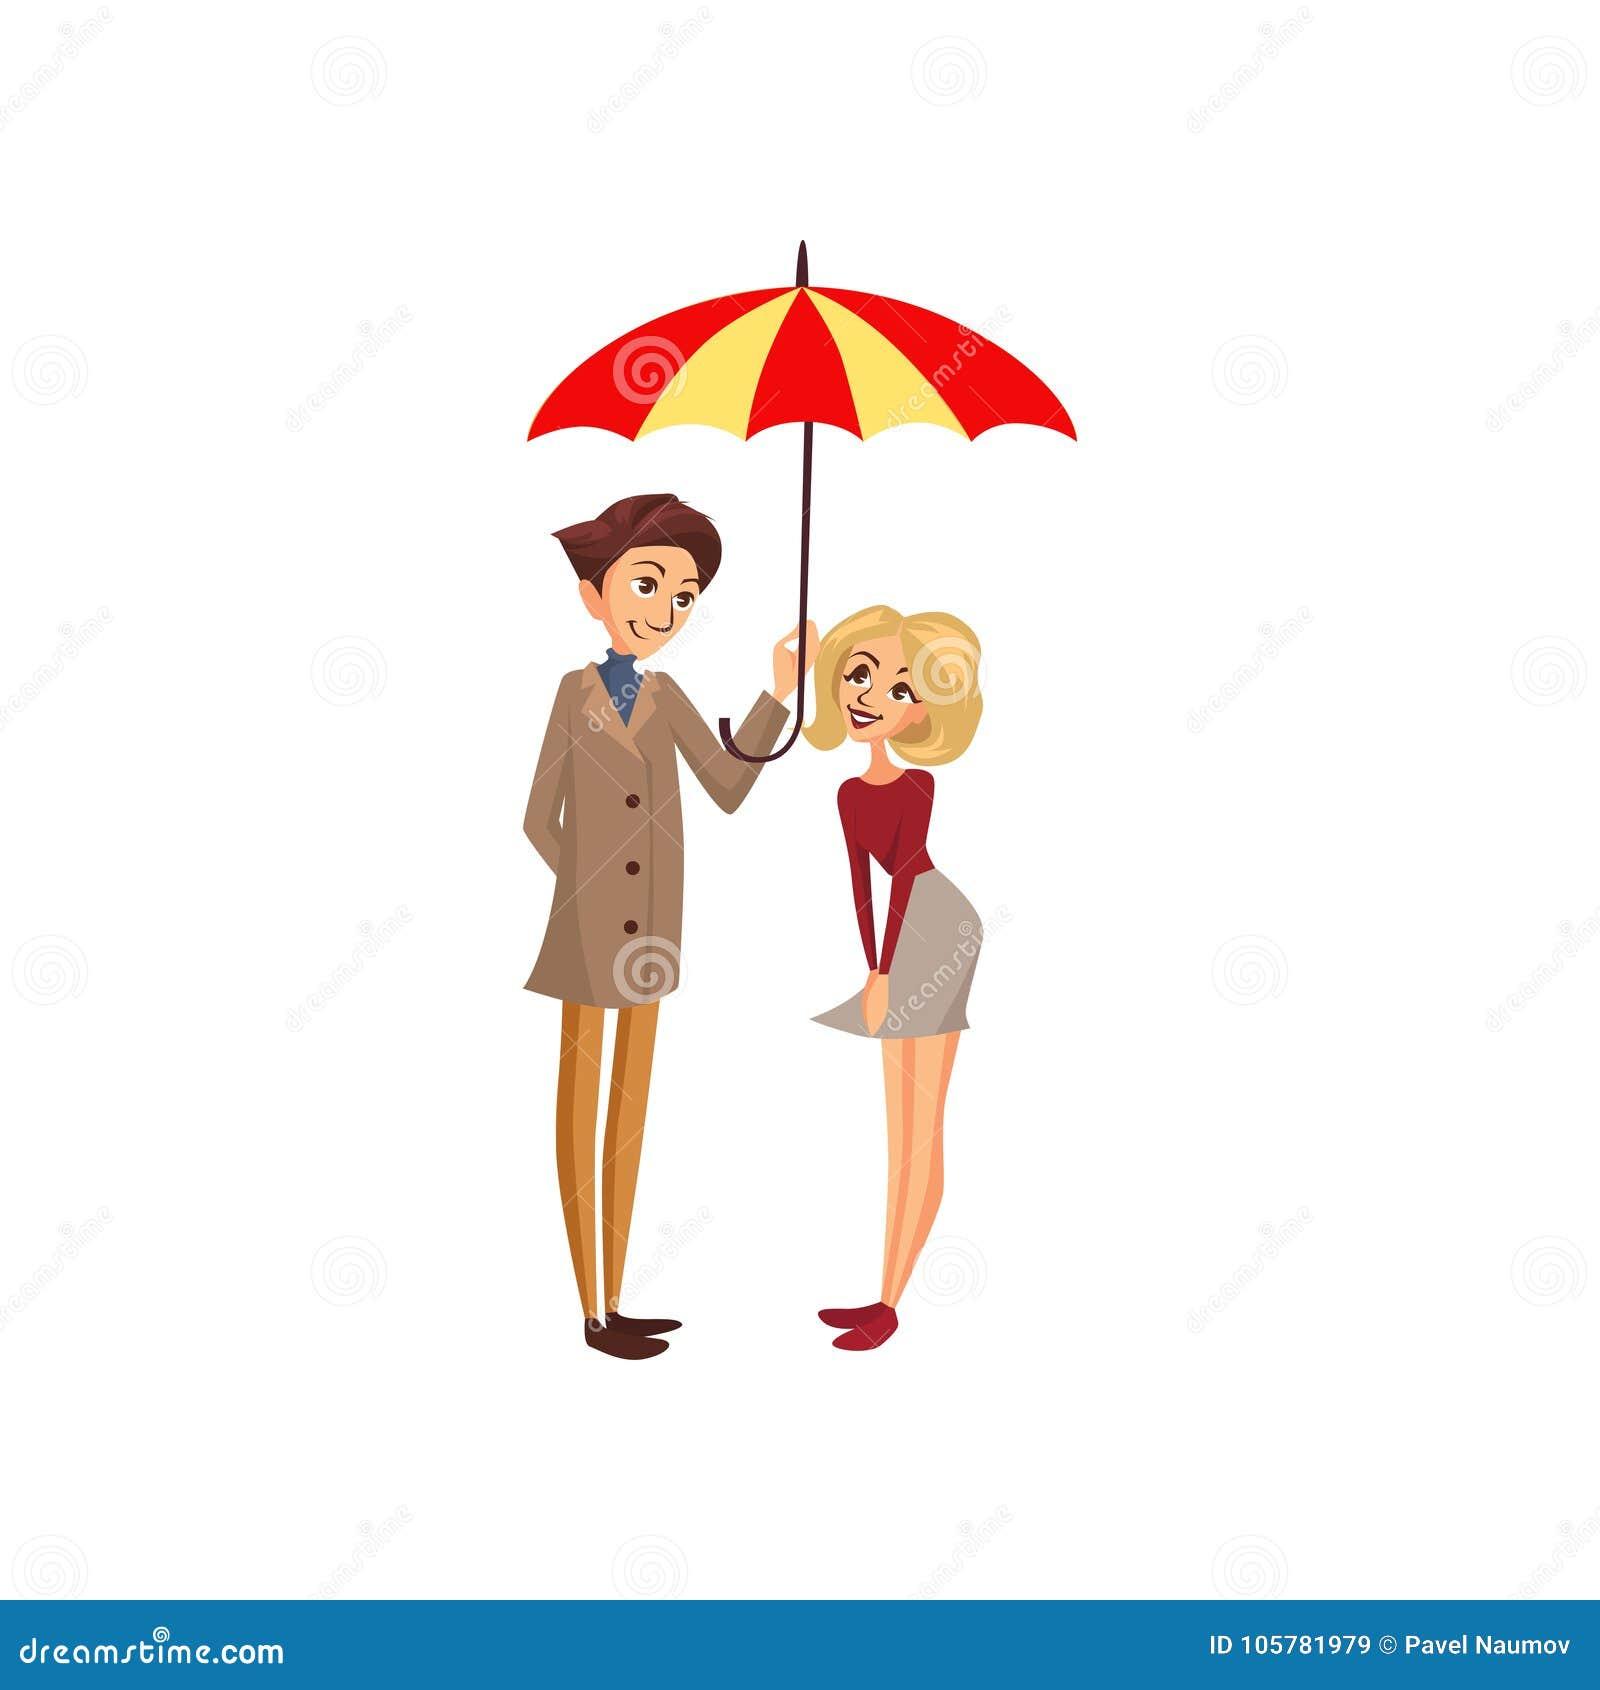 Happy couple under one big striped umbrella, rainy weather concept cartoon vector Illustration